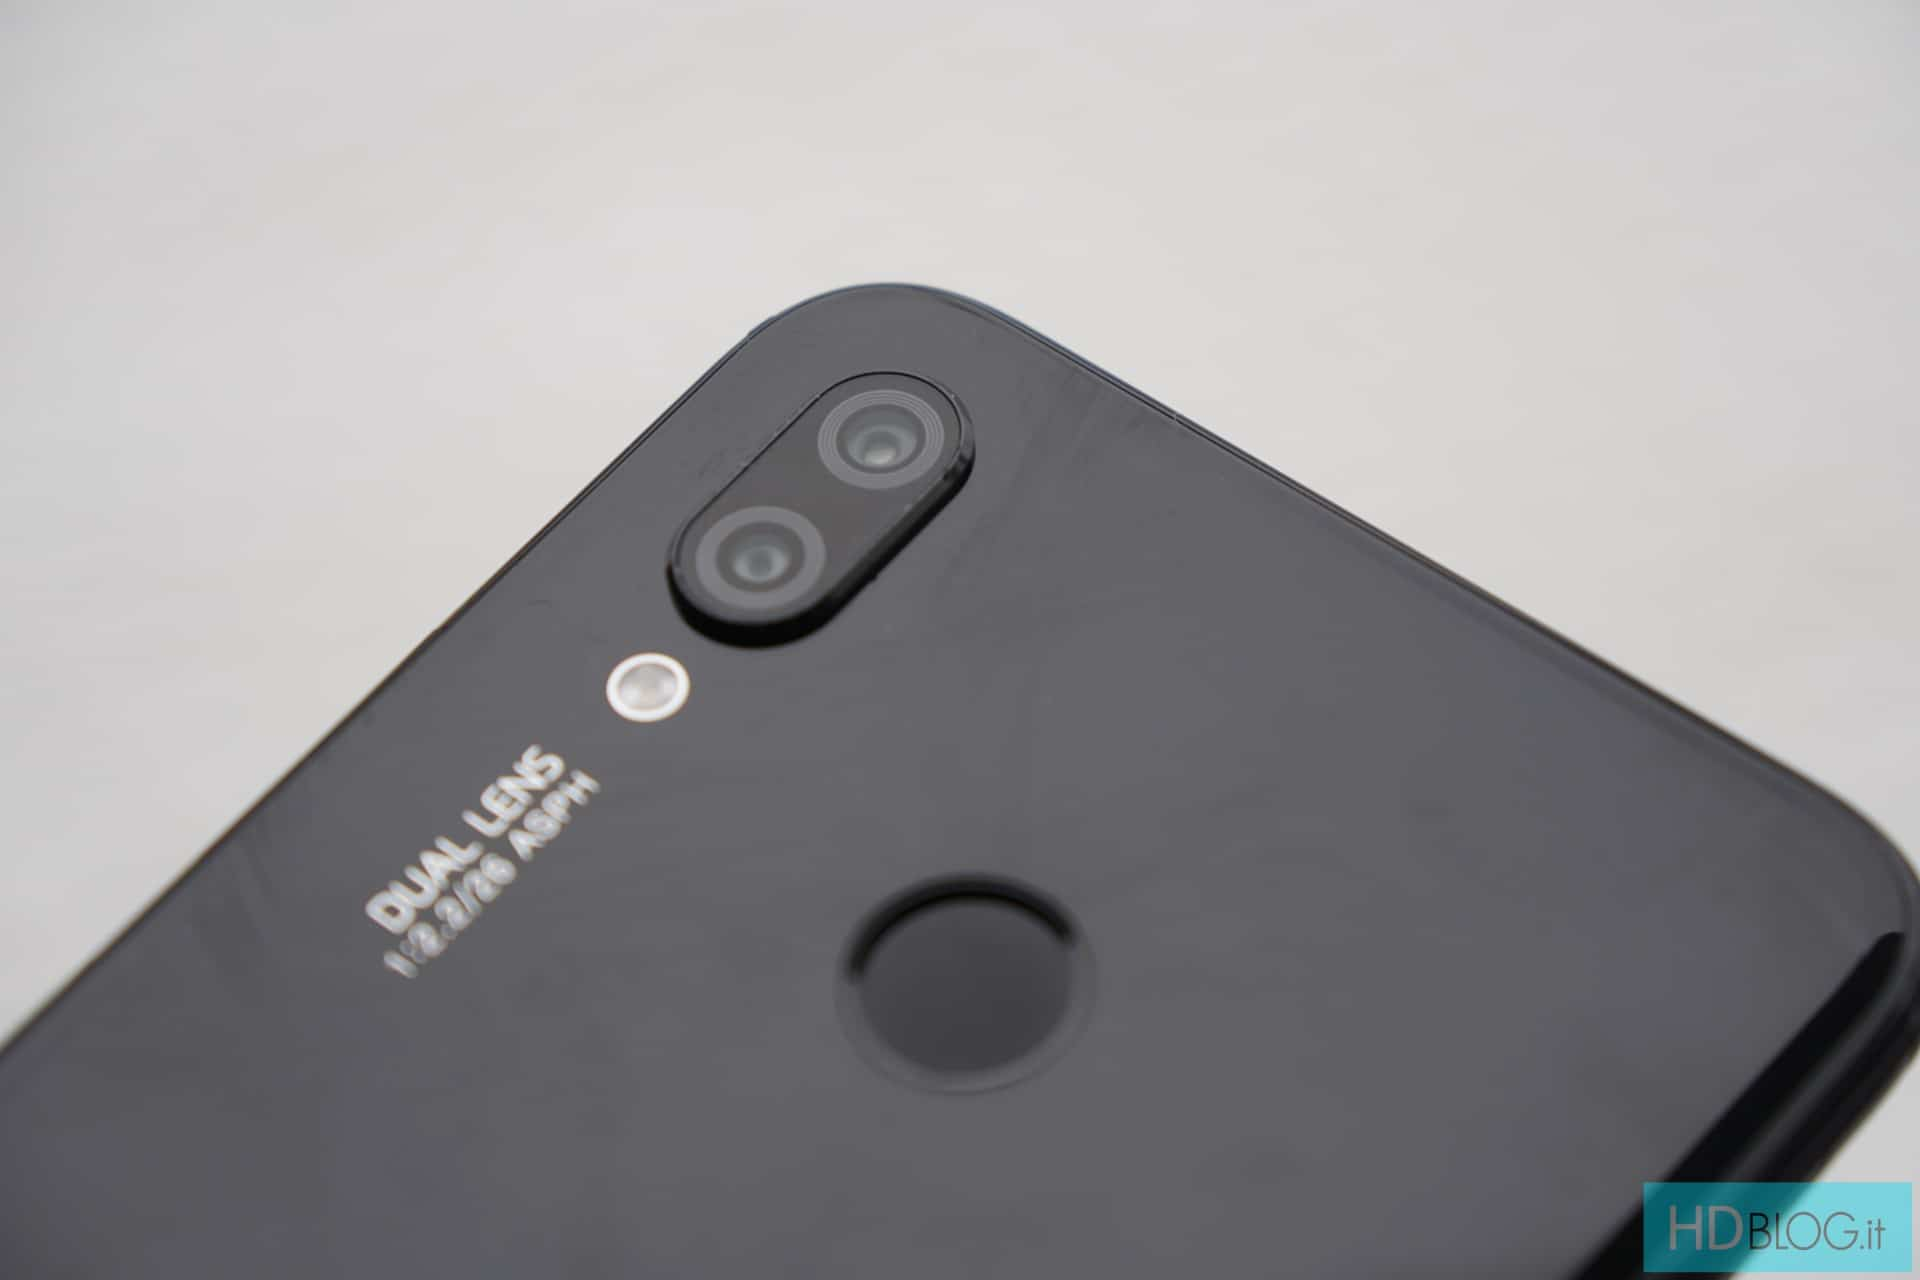 Huawei P20 Lite HDBlog image prelaunch 24